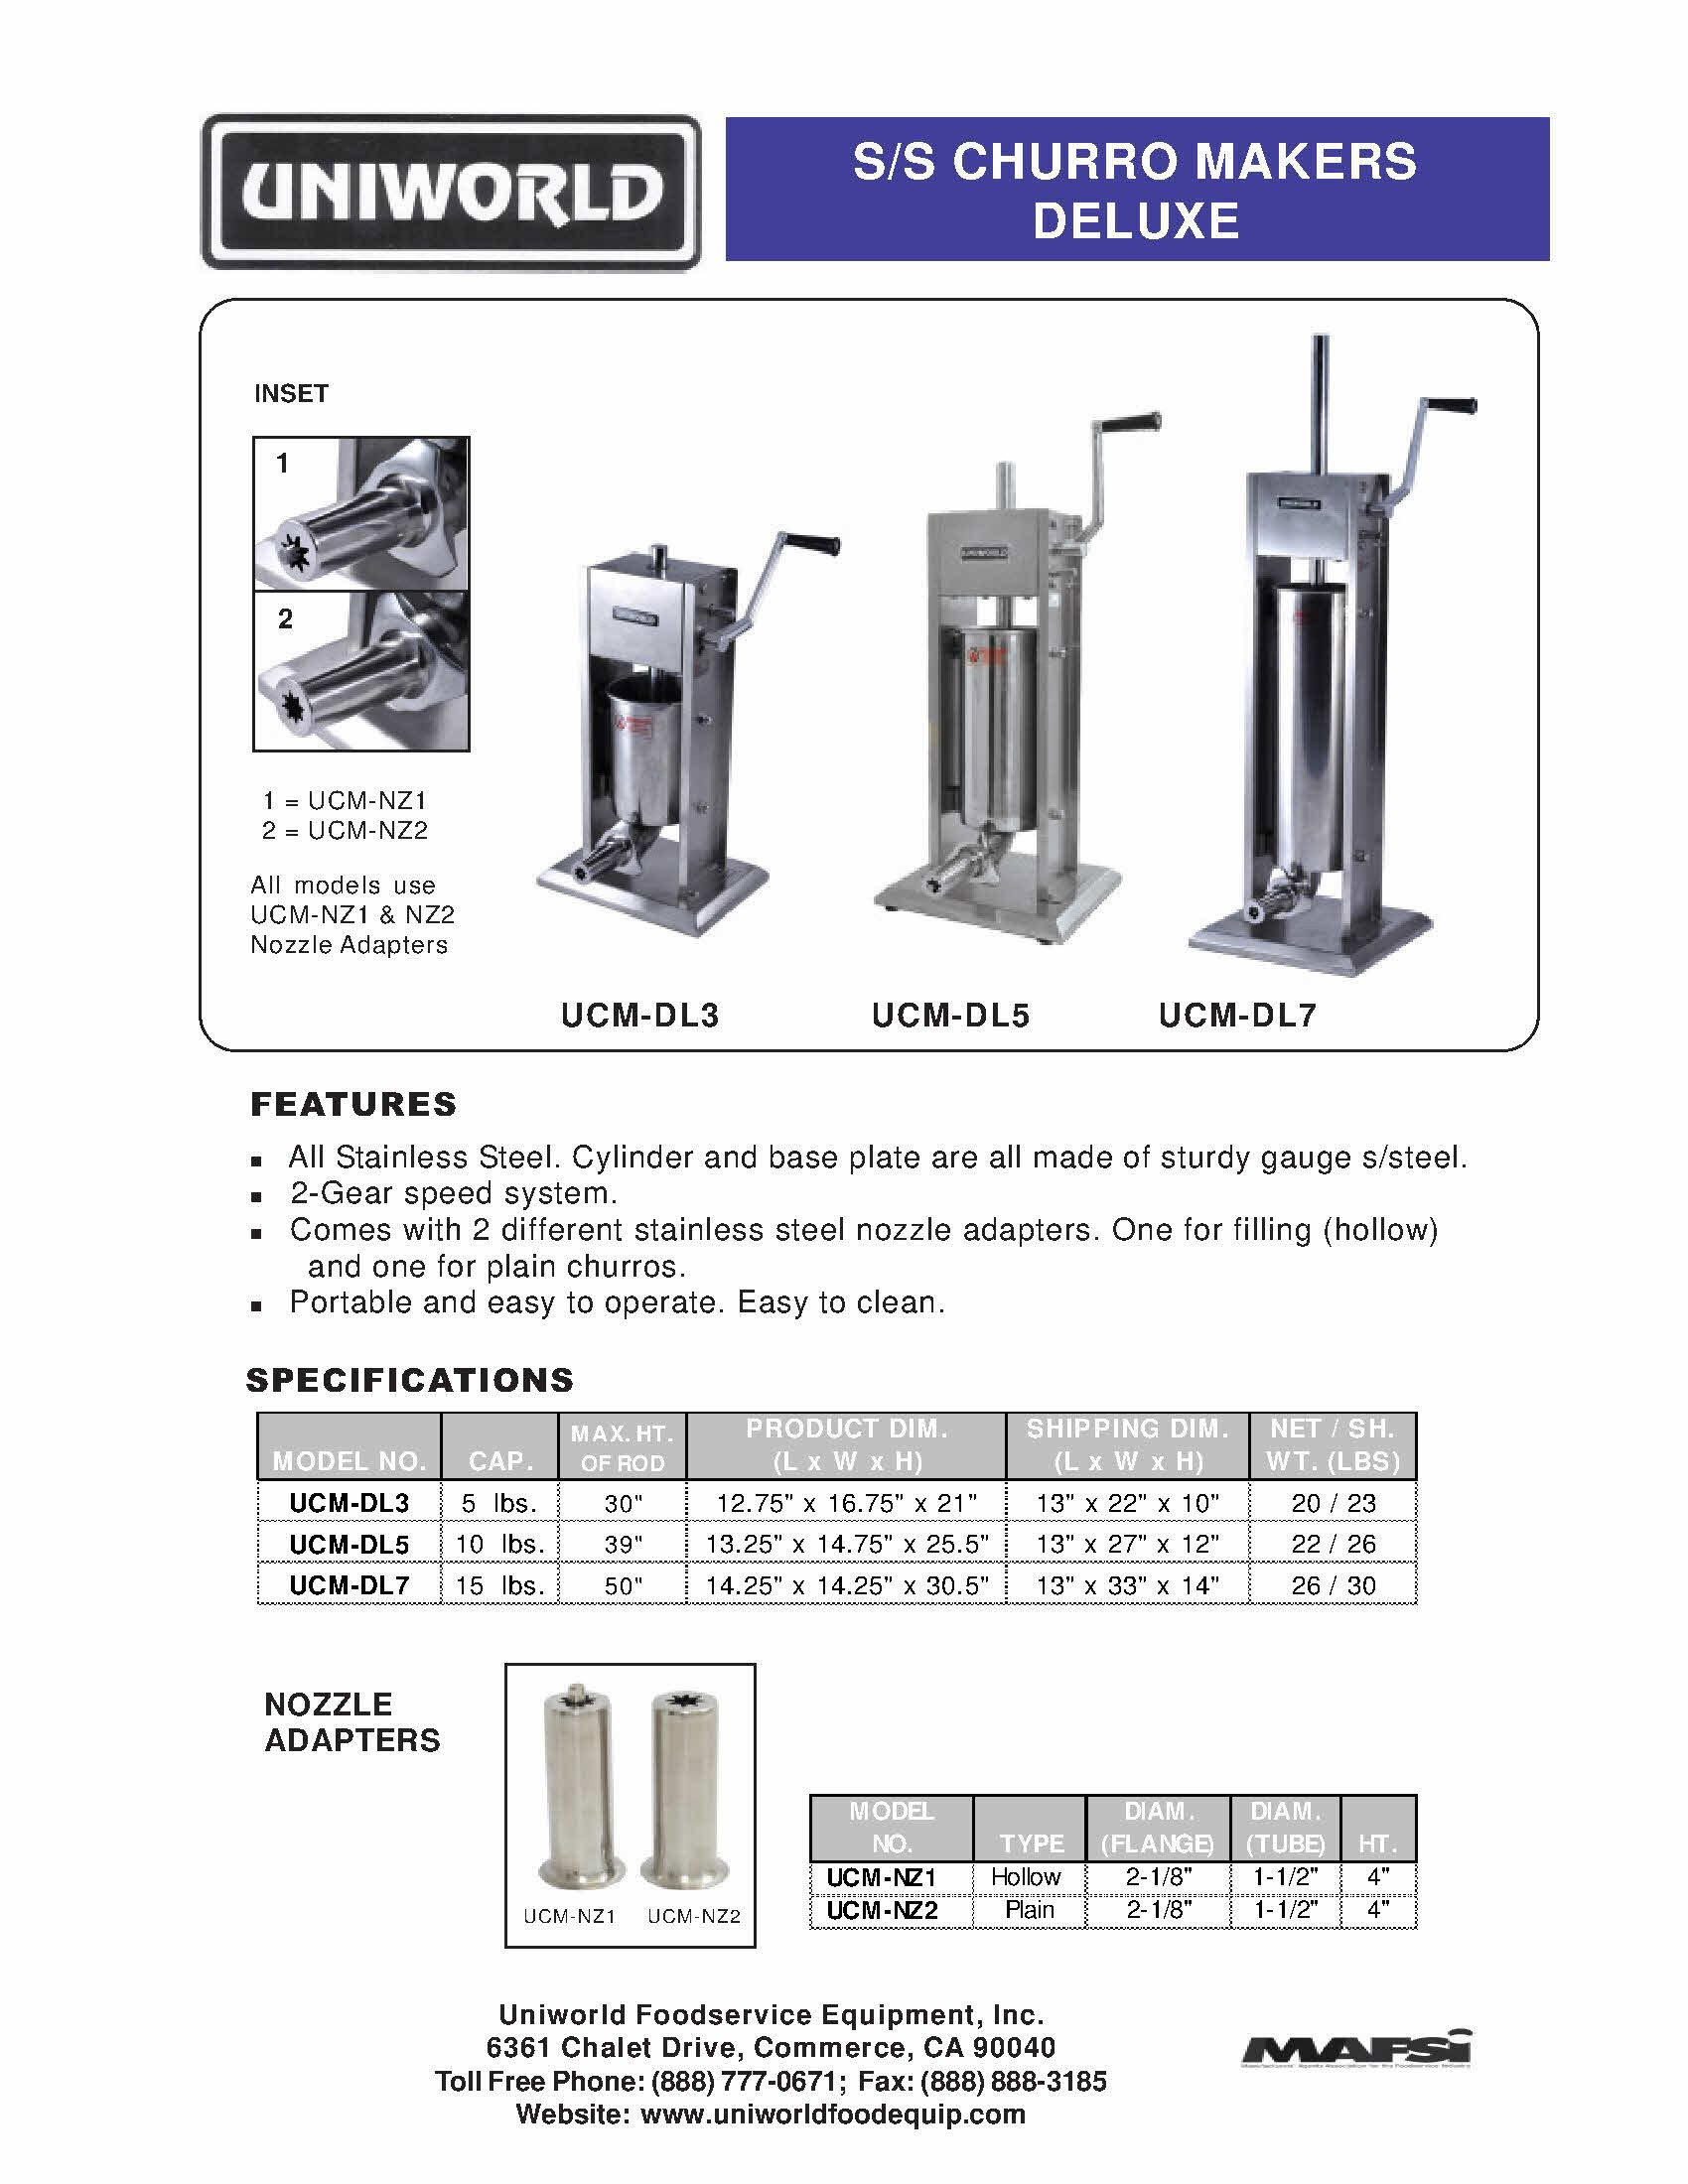 Uniworld CHURRO Maker UCM-STV3 Economy 5 lb Stainless Steel Manual Machine